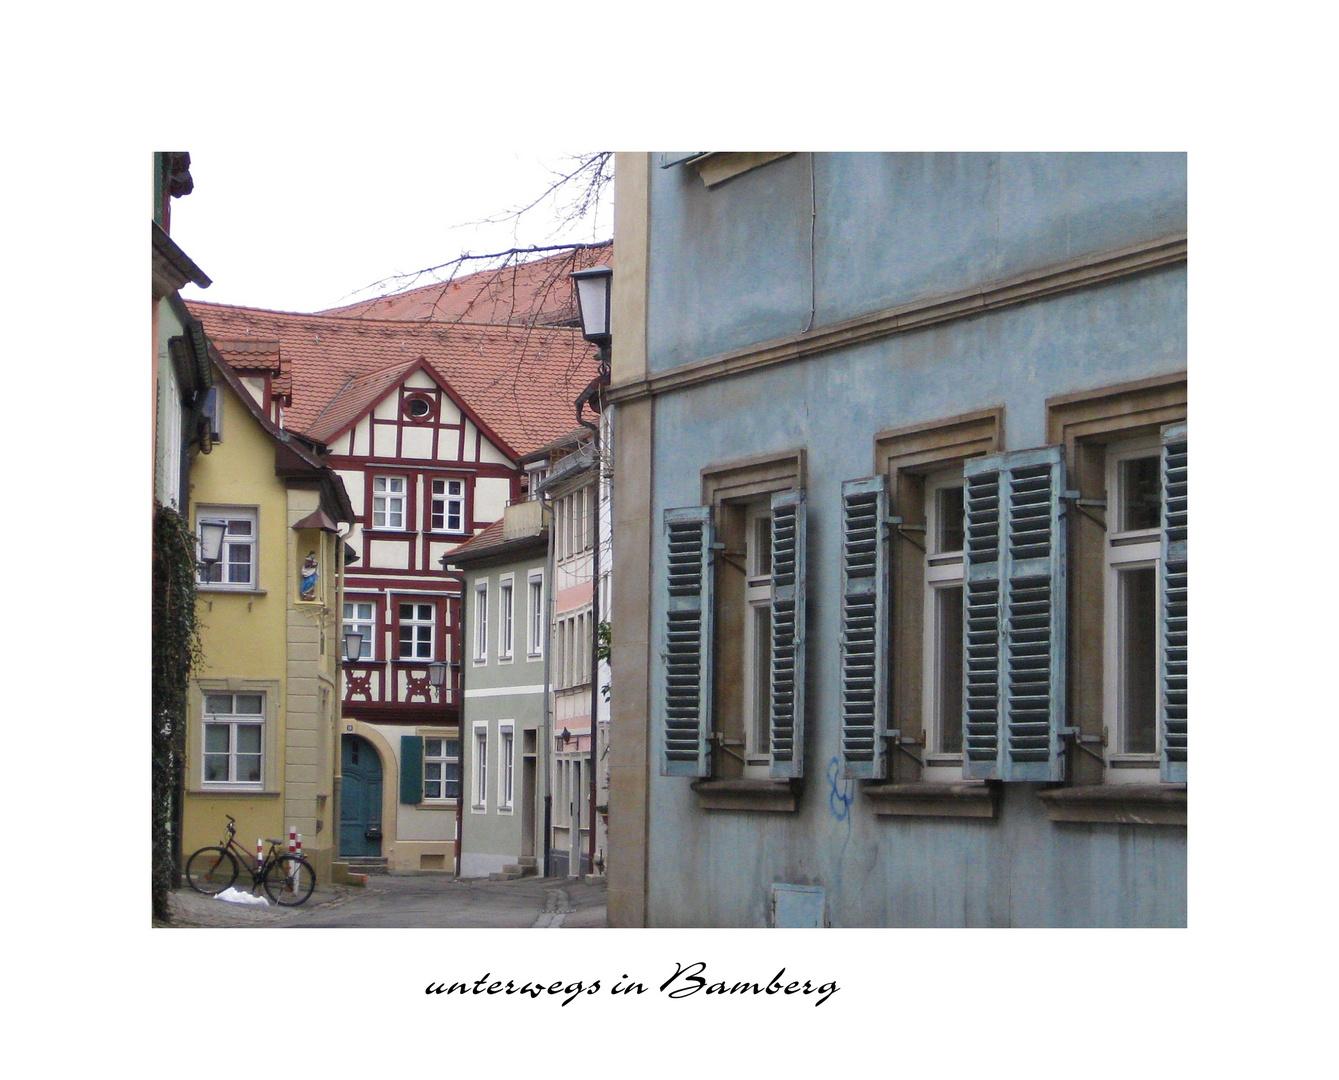 Schönes Bamberg I